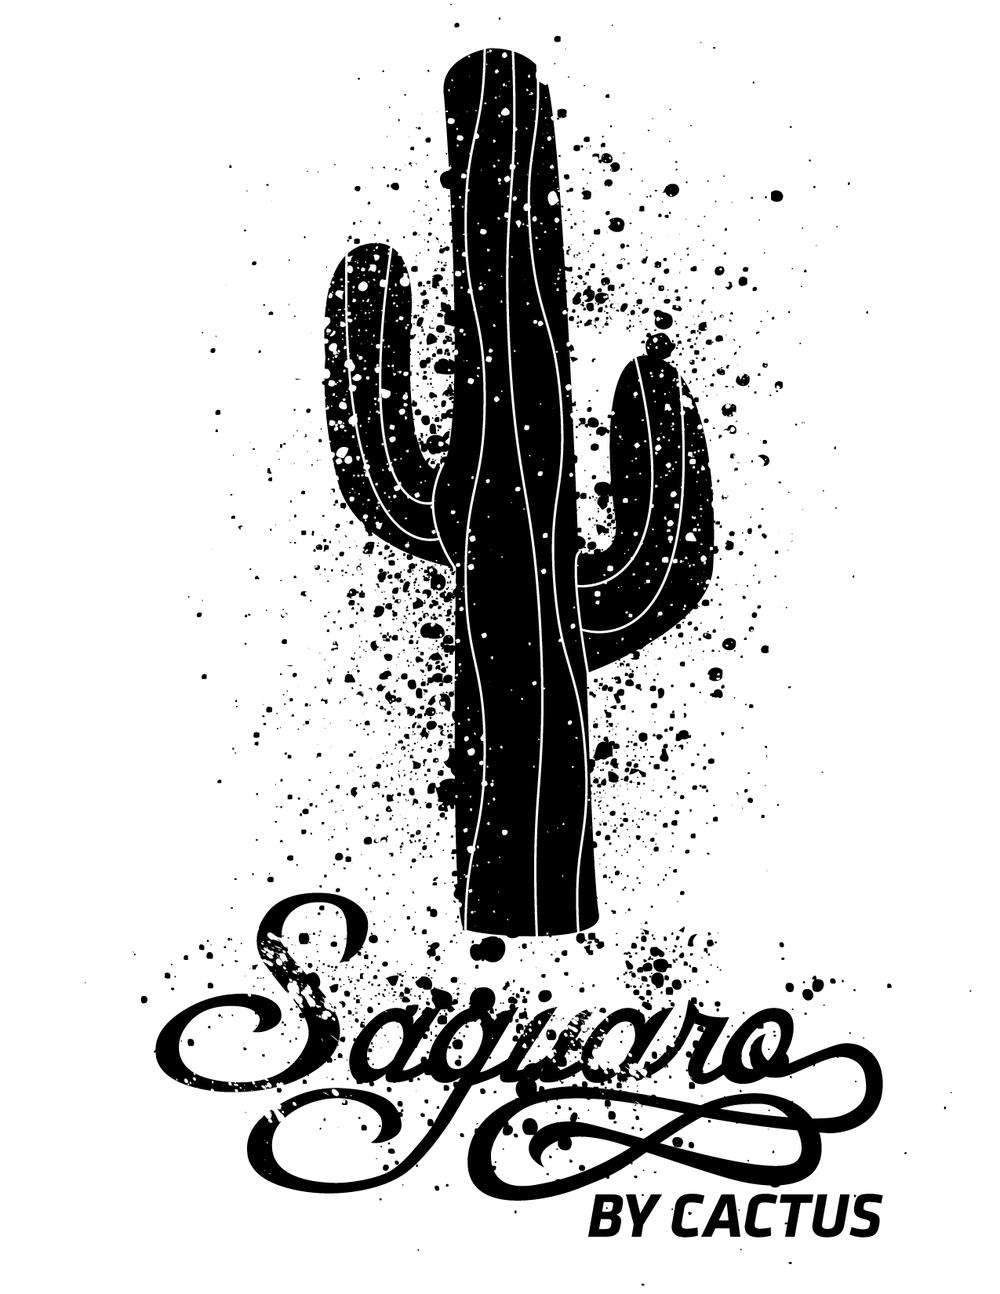 Saguaro by Cactus-02.jpg